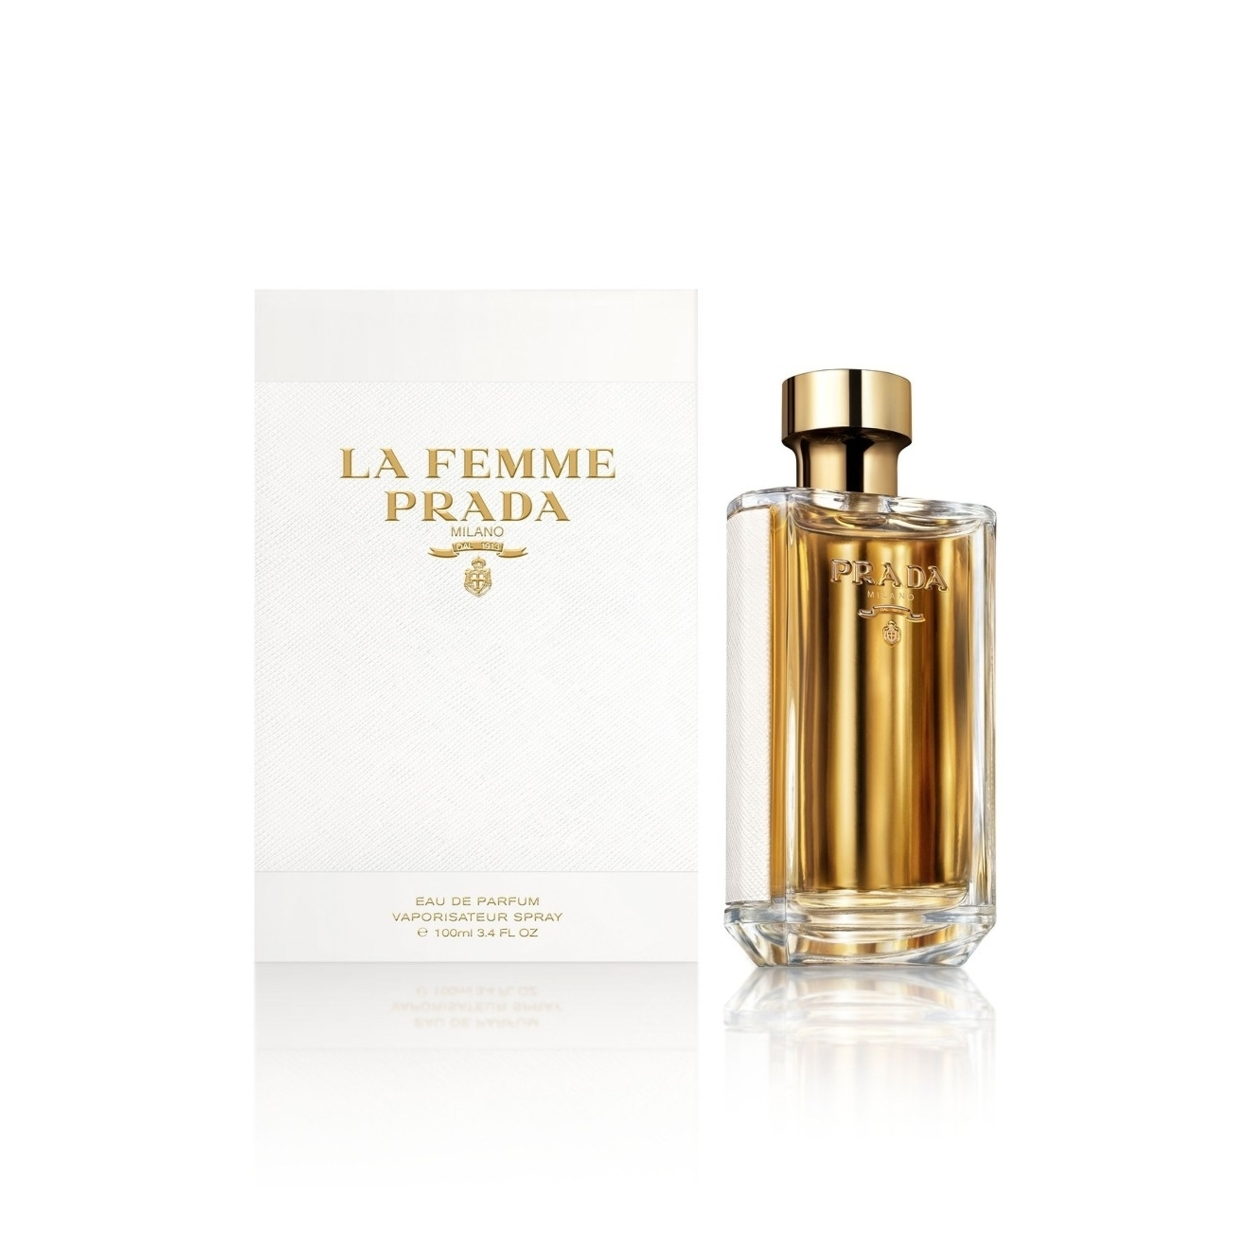 Prada La Femme 3.4 Edp Sp prada la femme prada лосьон для тела la femme prada лосьон для тела